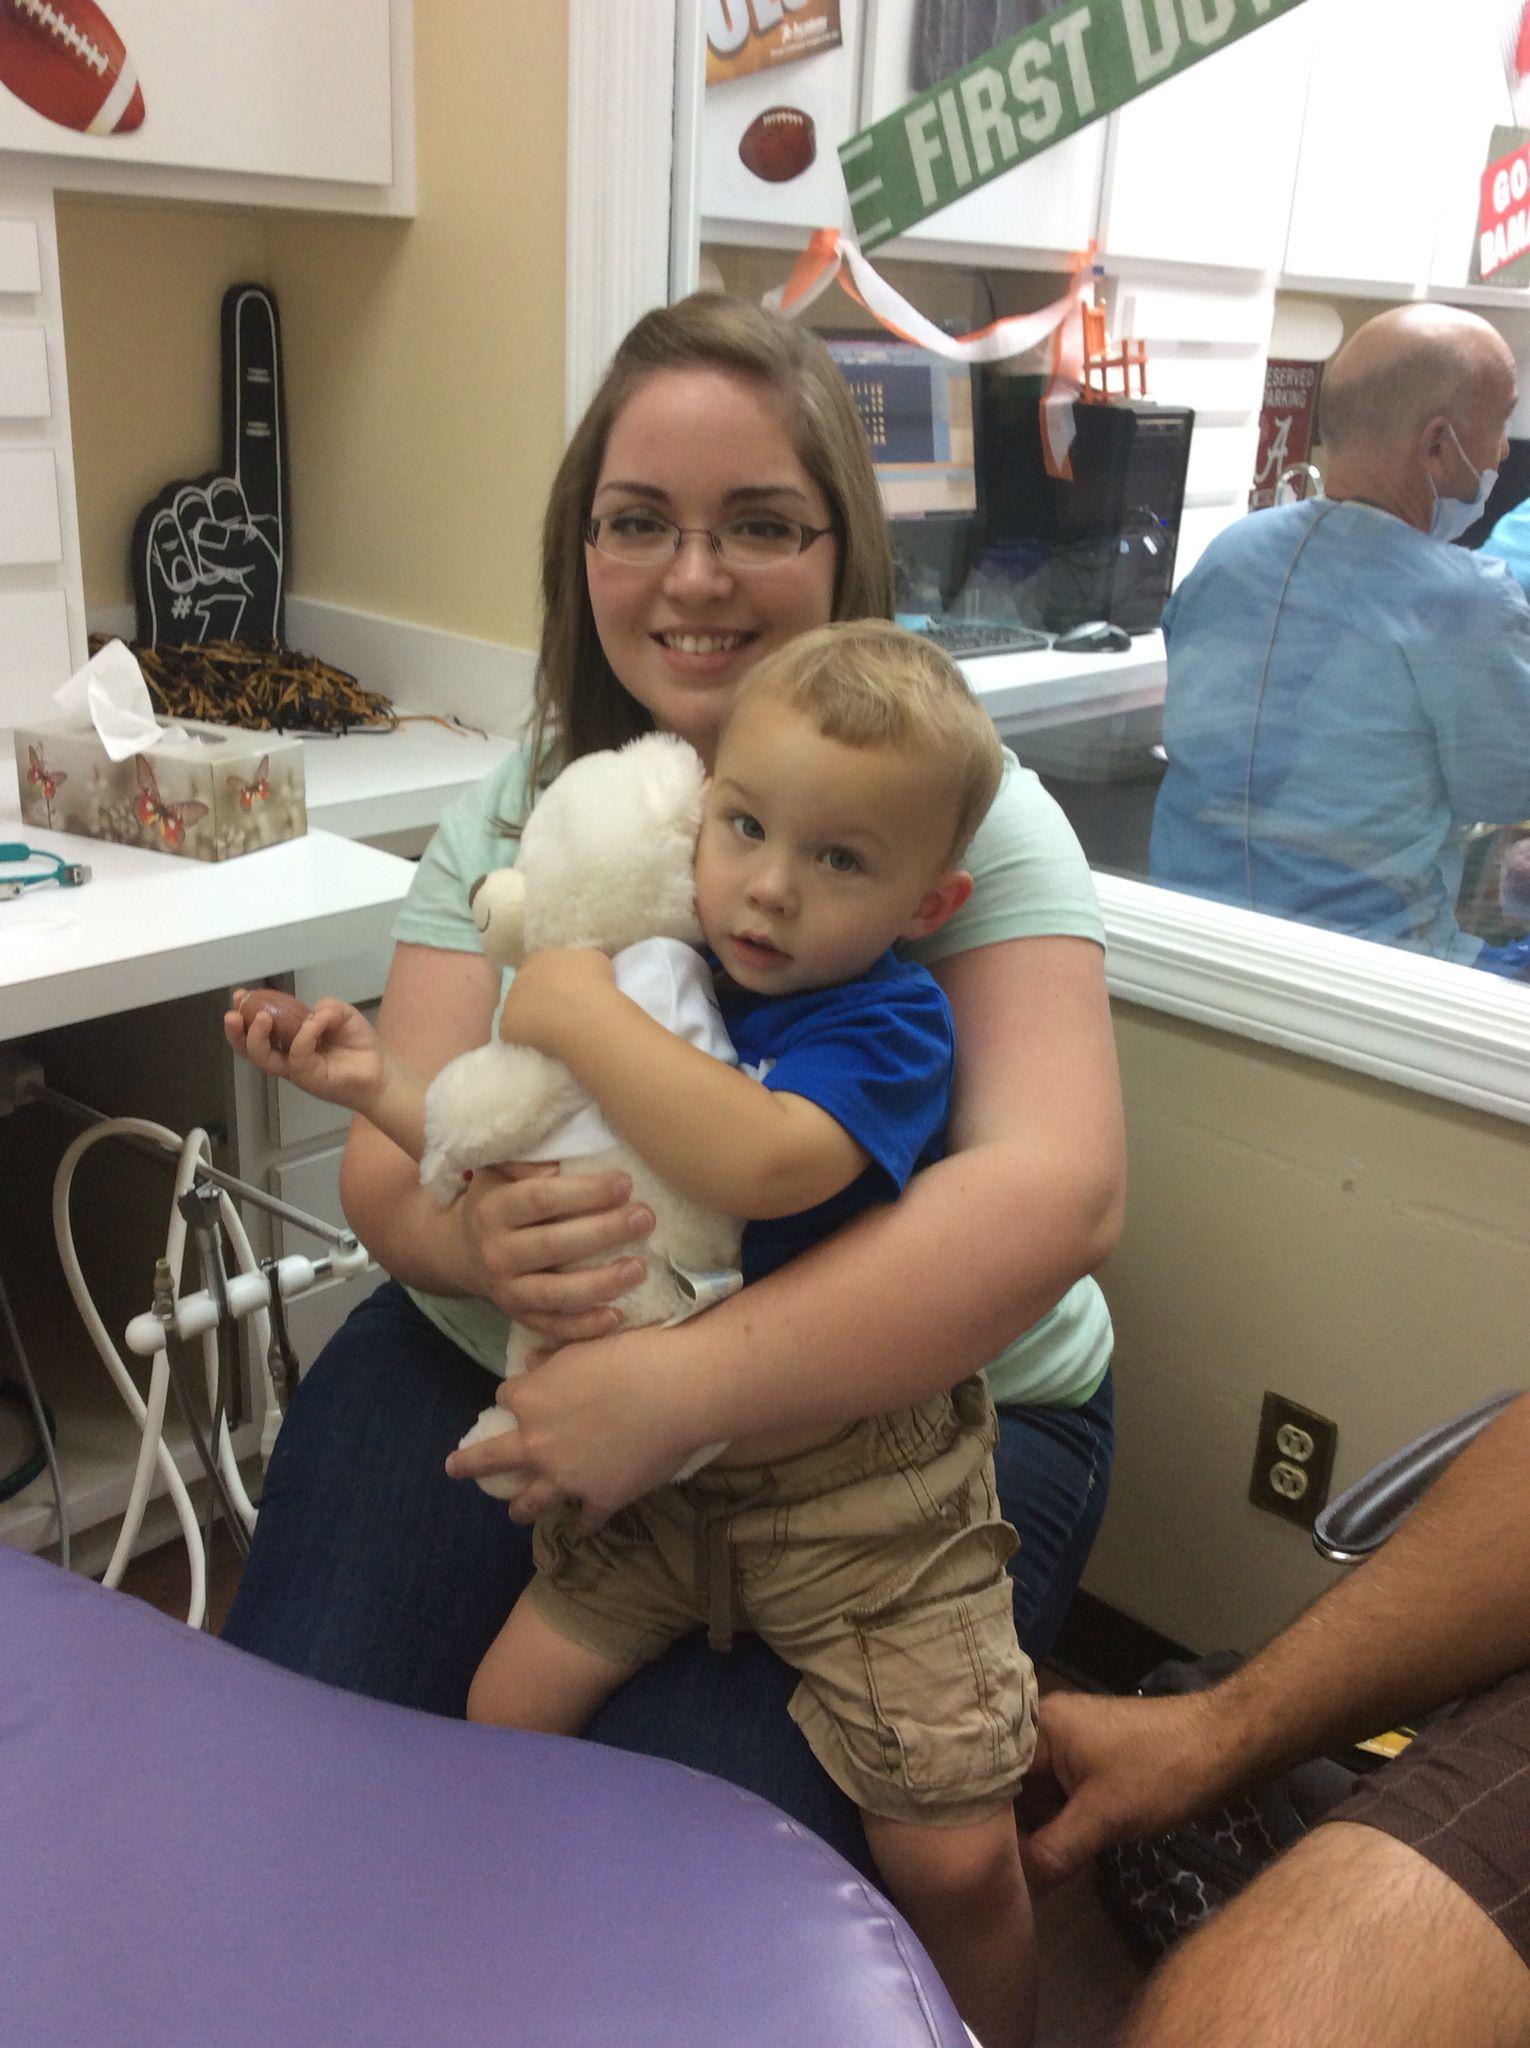 What a fantastic first visit sweet boy!! Pediatric